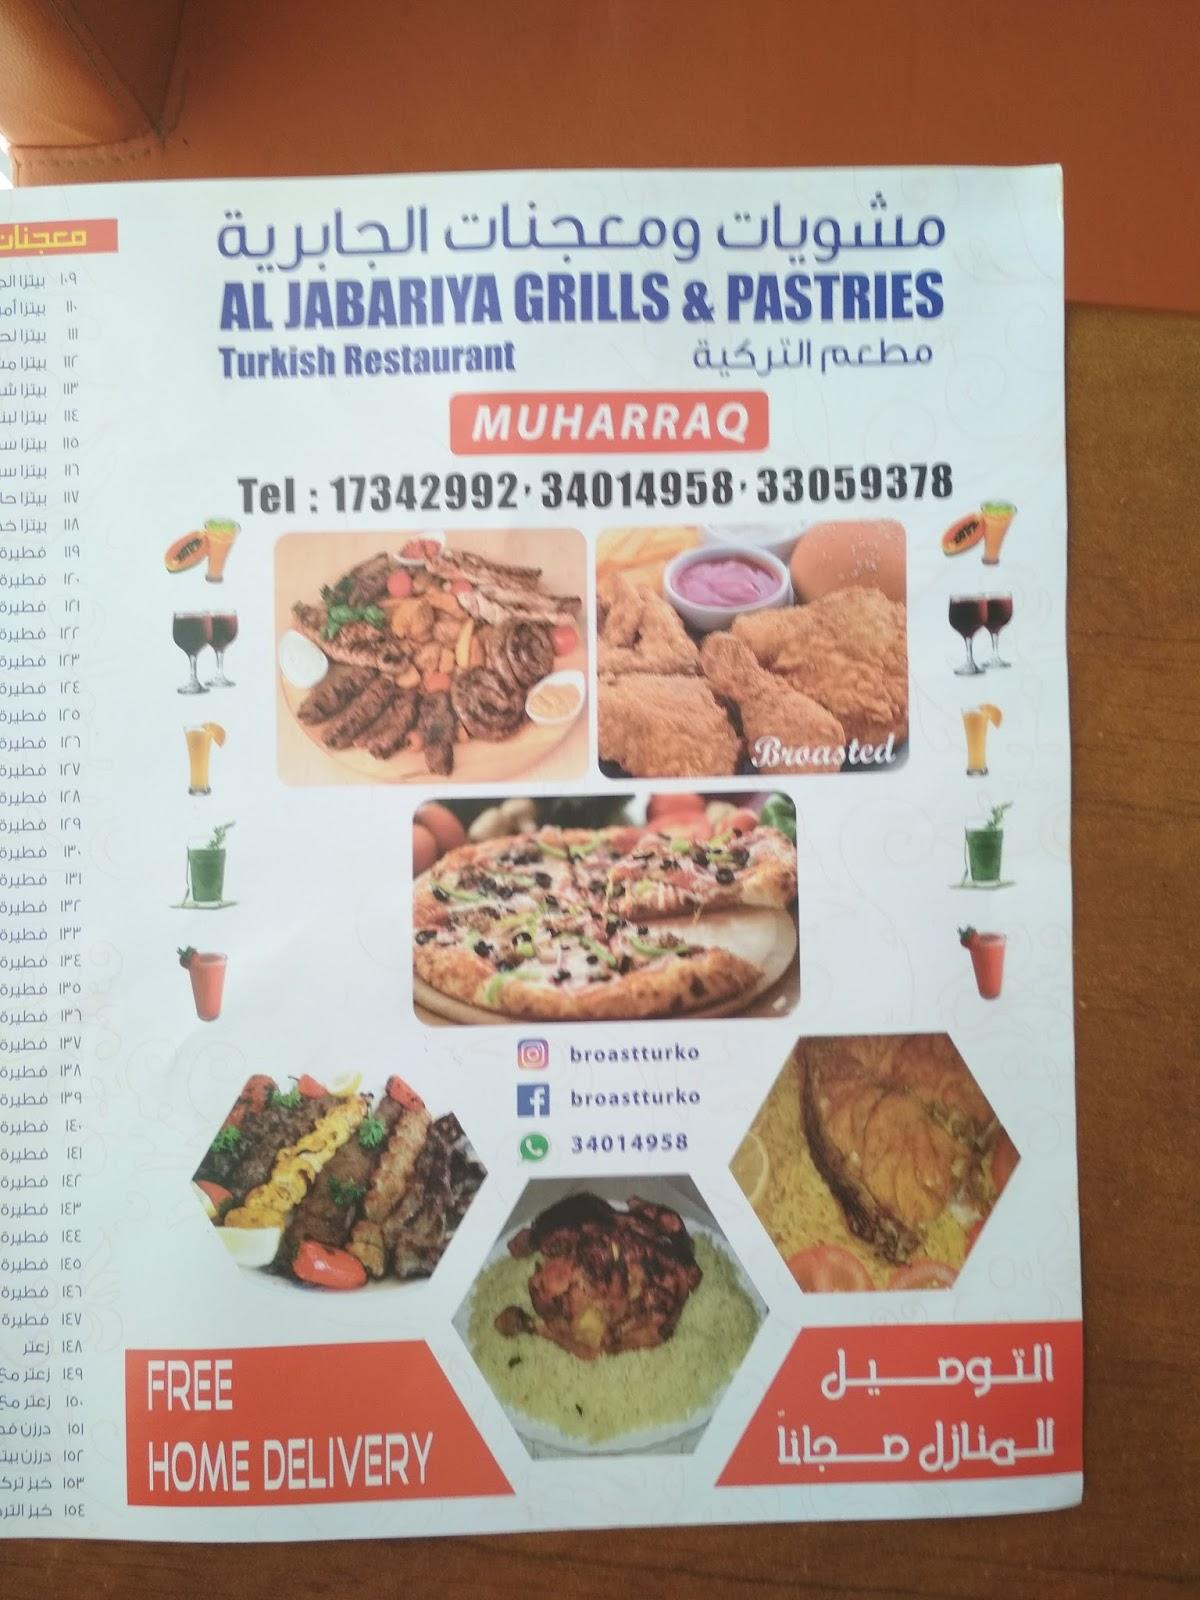 Best things to do in Bahrain: Turkish Restaurants in Bahrain